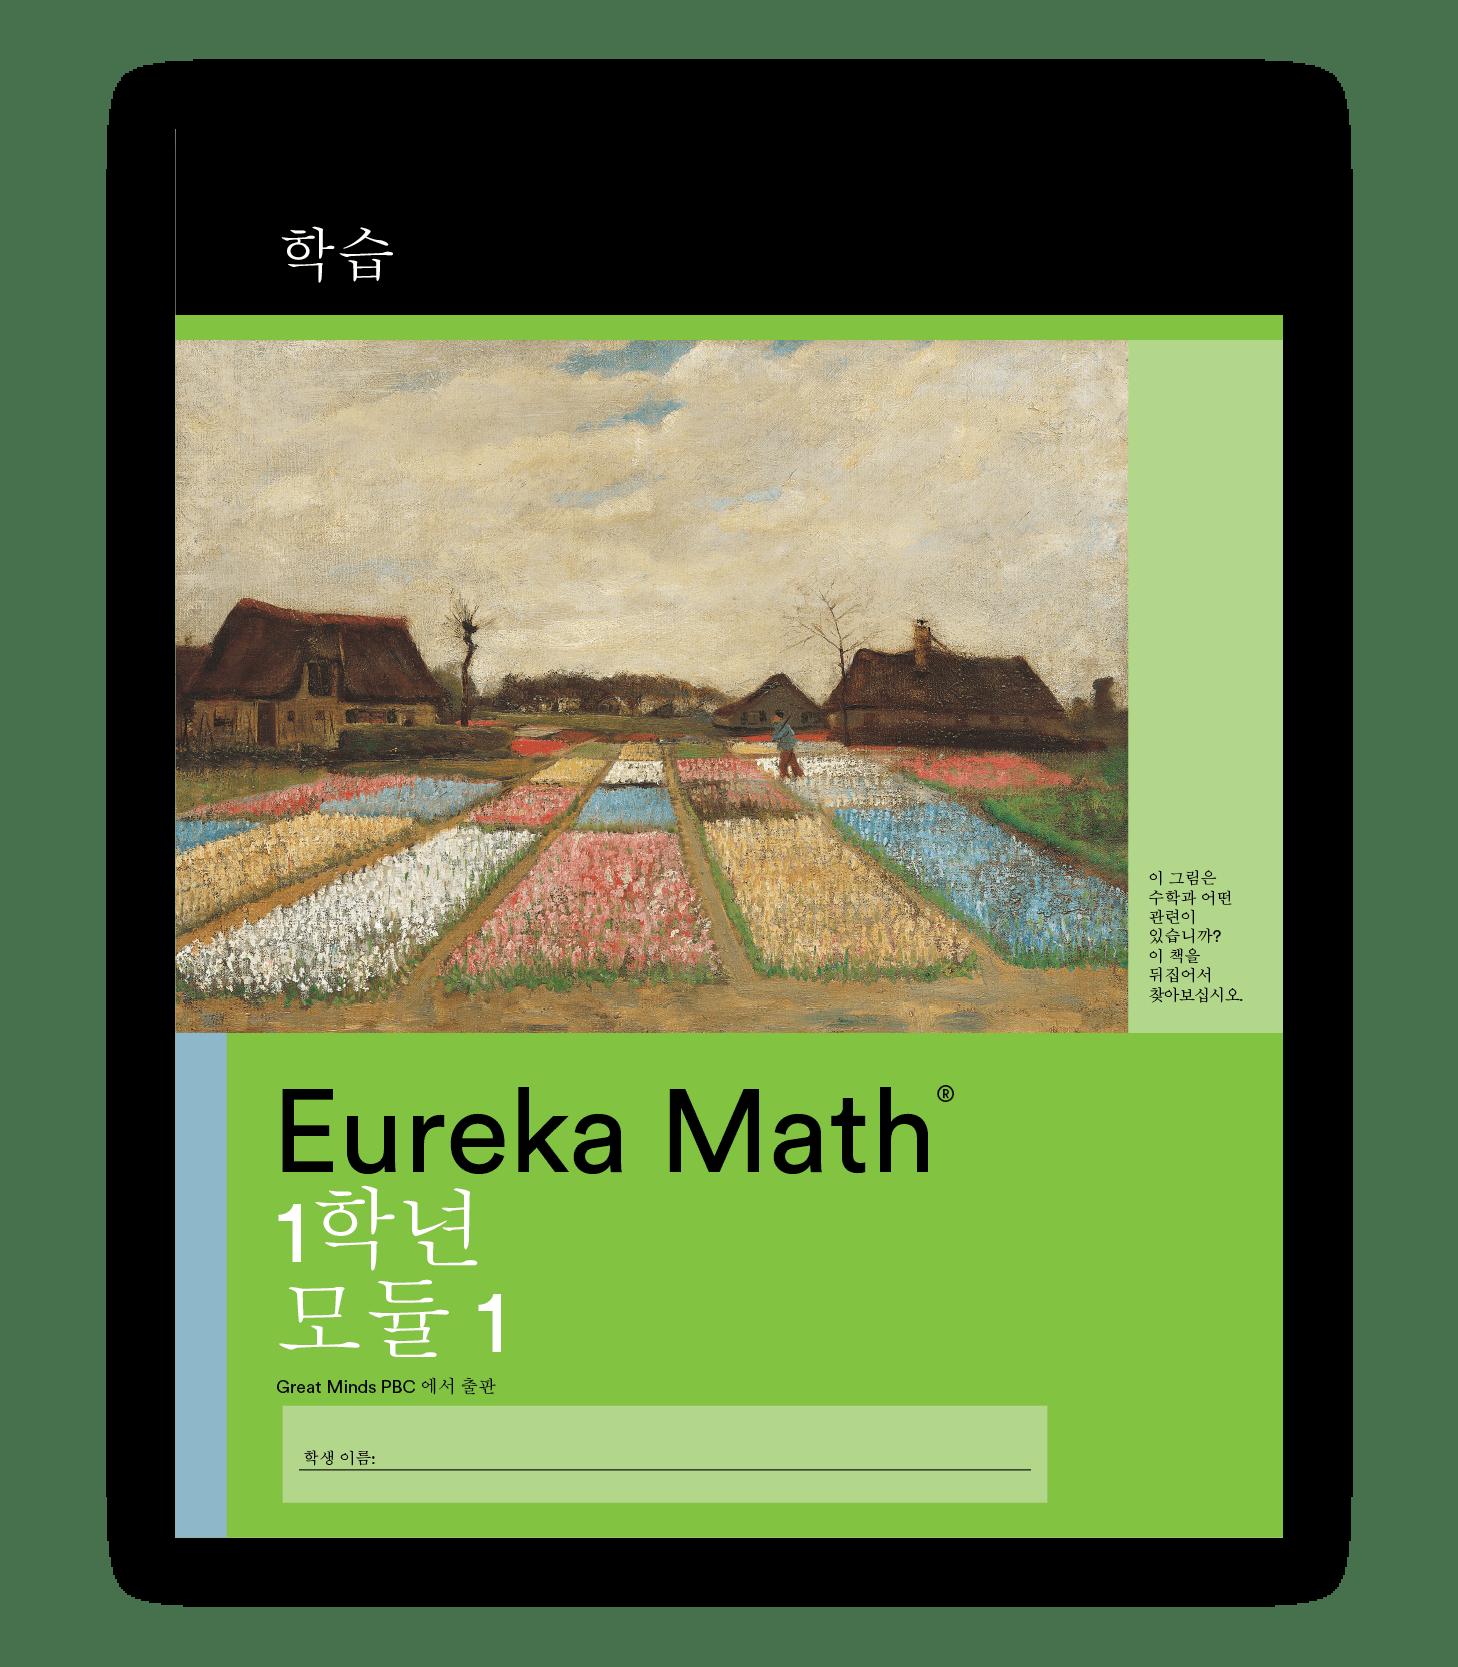 Eureka Math Learn Book in Korean for Grade 1